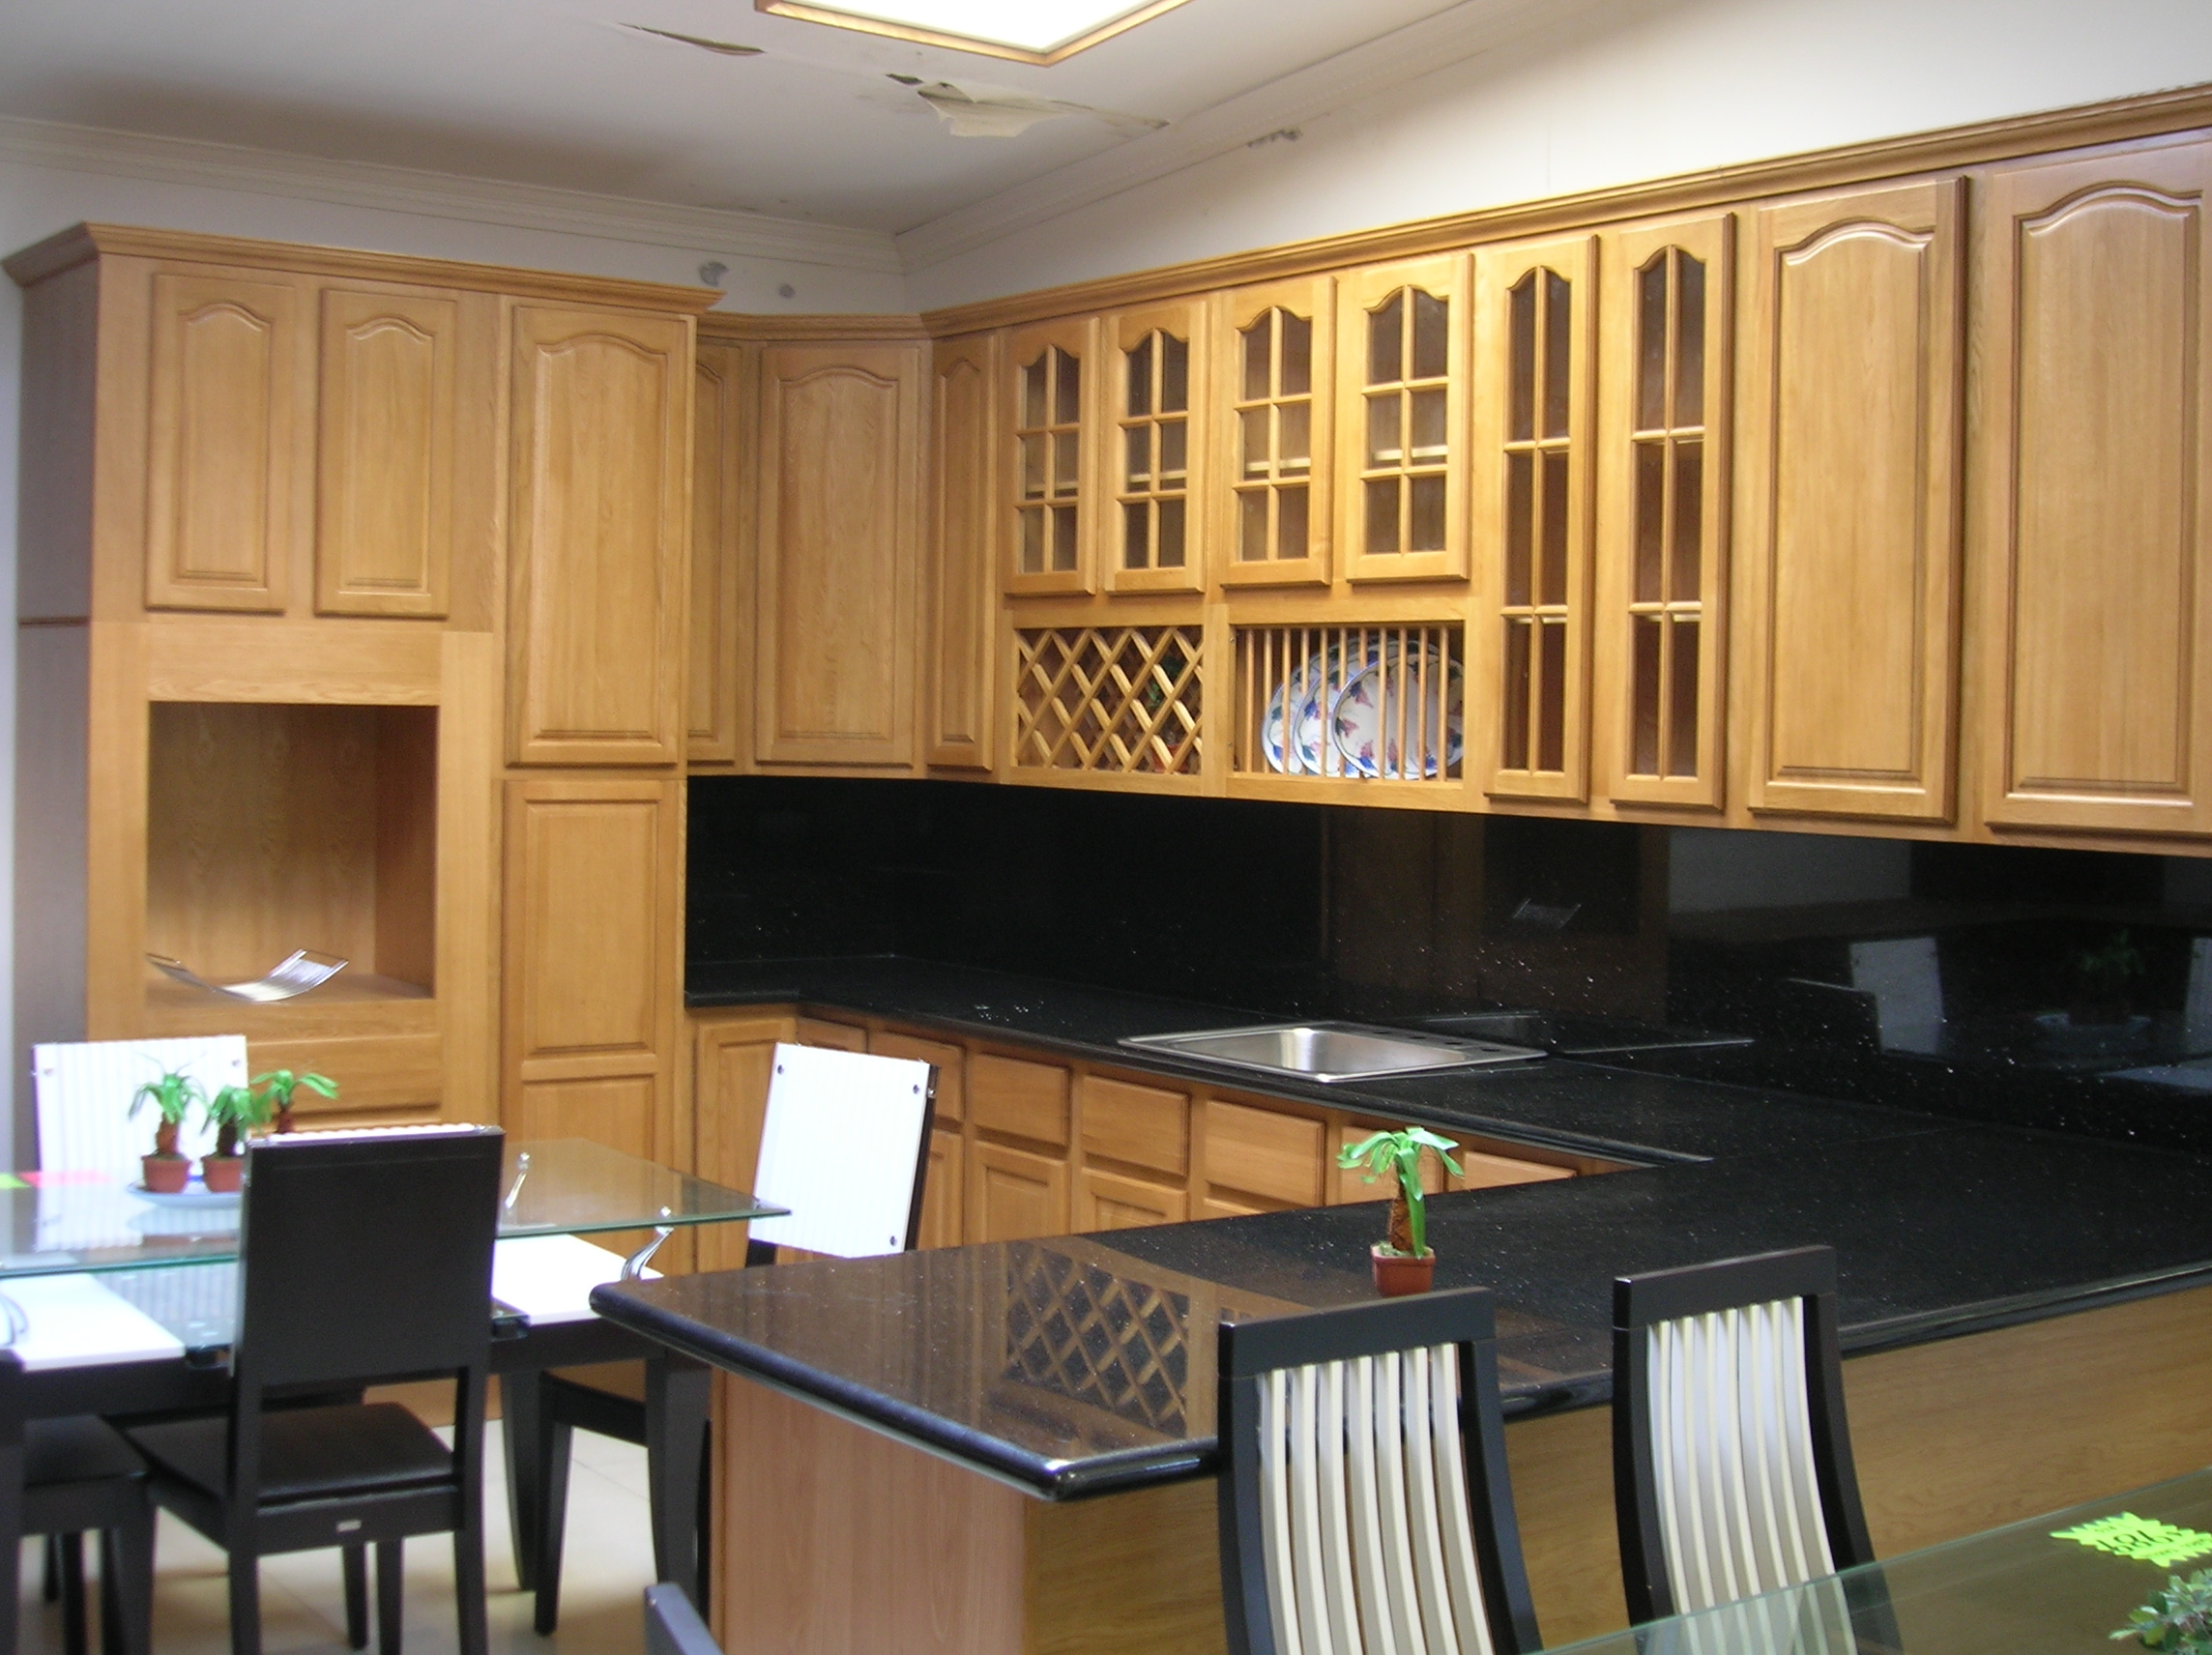 allcabinets affordable kitchen cabinets Oak Cherry Wholesale Kitchen Cabinets